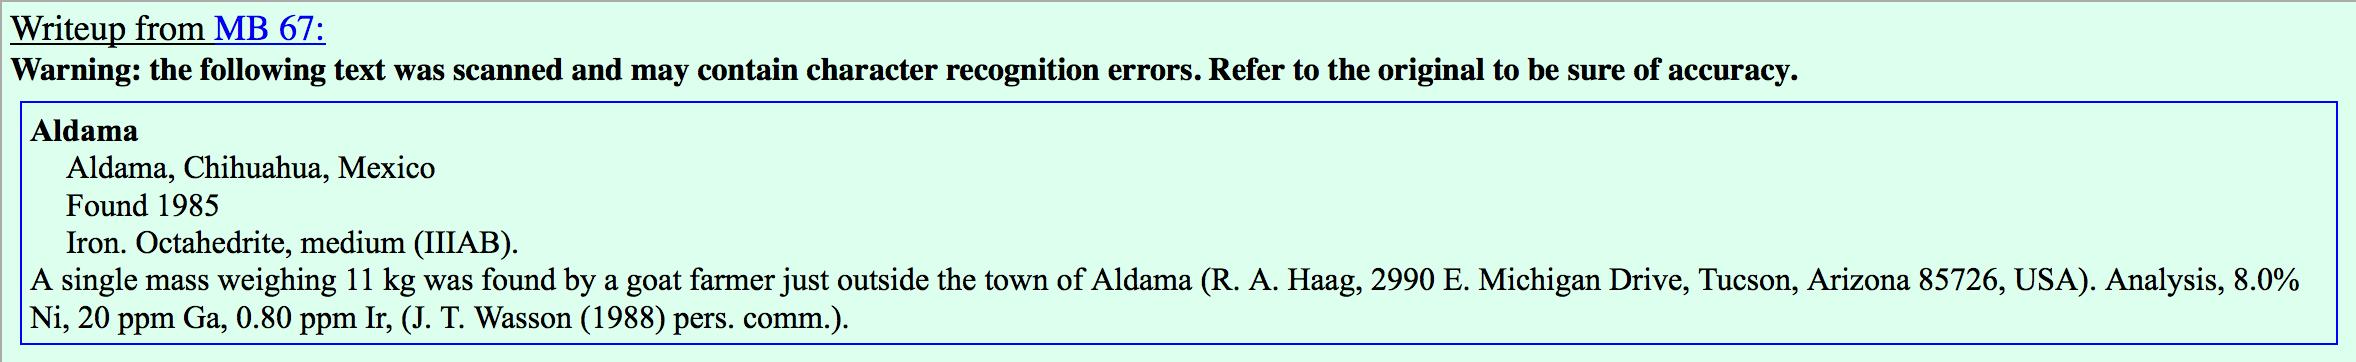 Aldama (a) write-up.